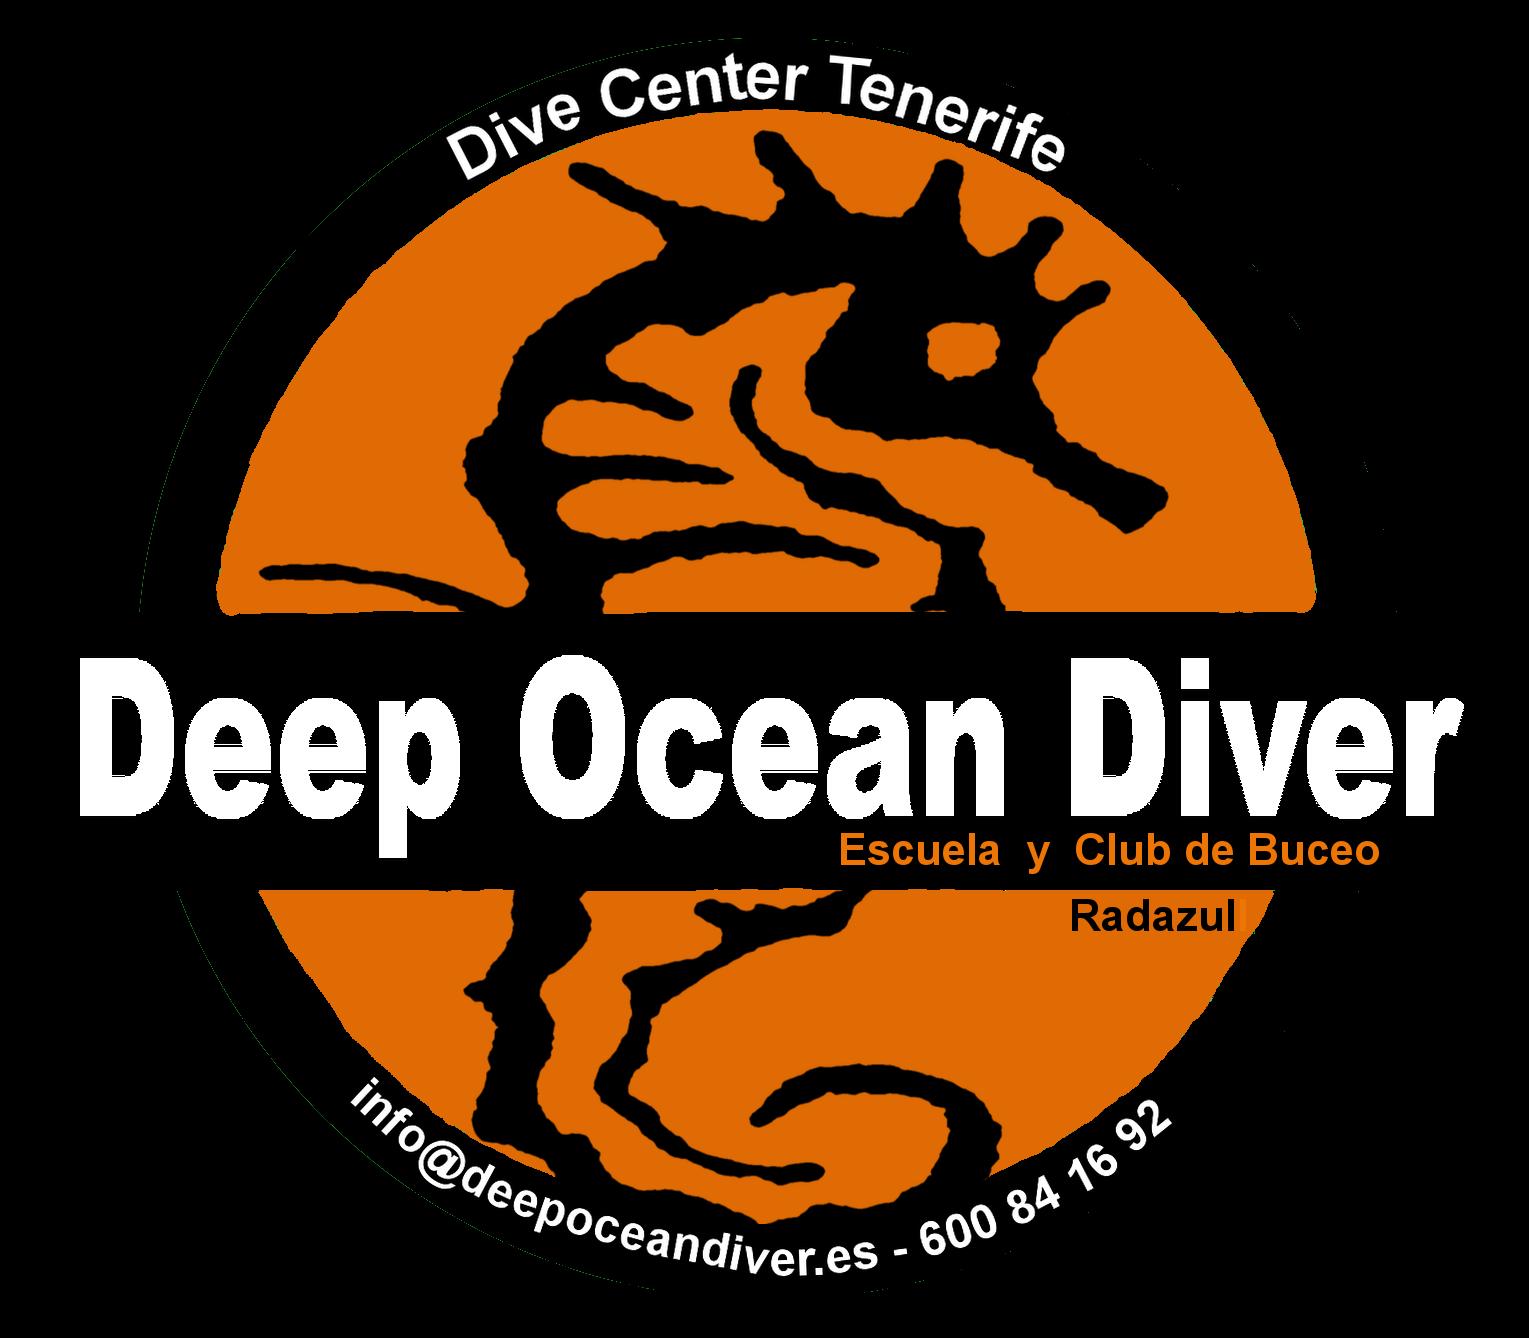 PADI 5 Estrellas & CRESSI Dive Center - Deep Ocean Diver Tenerife